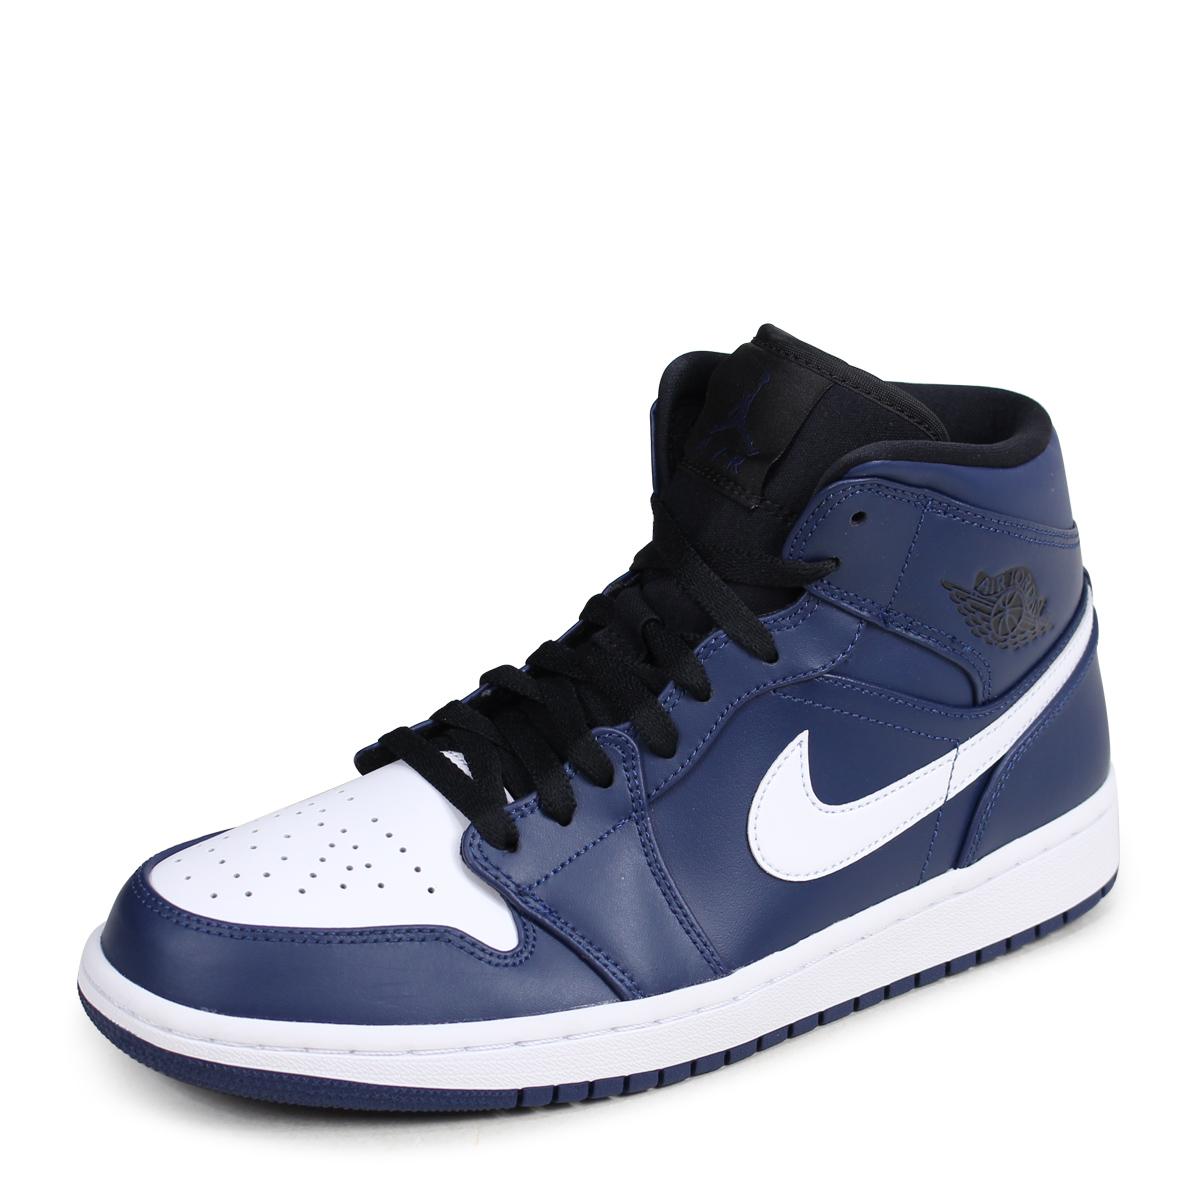 check out 2285b 69893 ... An NIKE AIR JORDAN 1 MID Nike Air Jordan 1 sneakers men 554,724-401 navy  ...